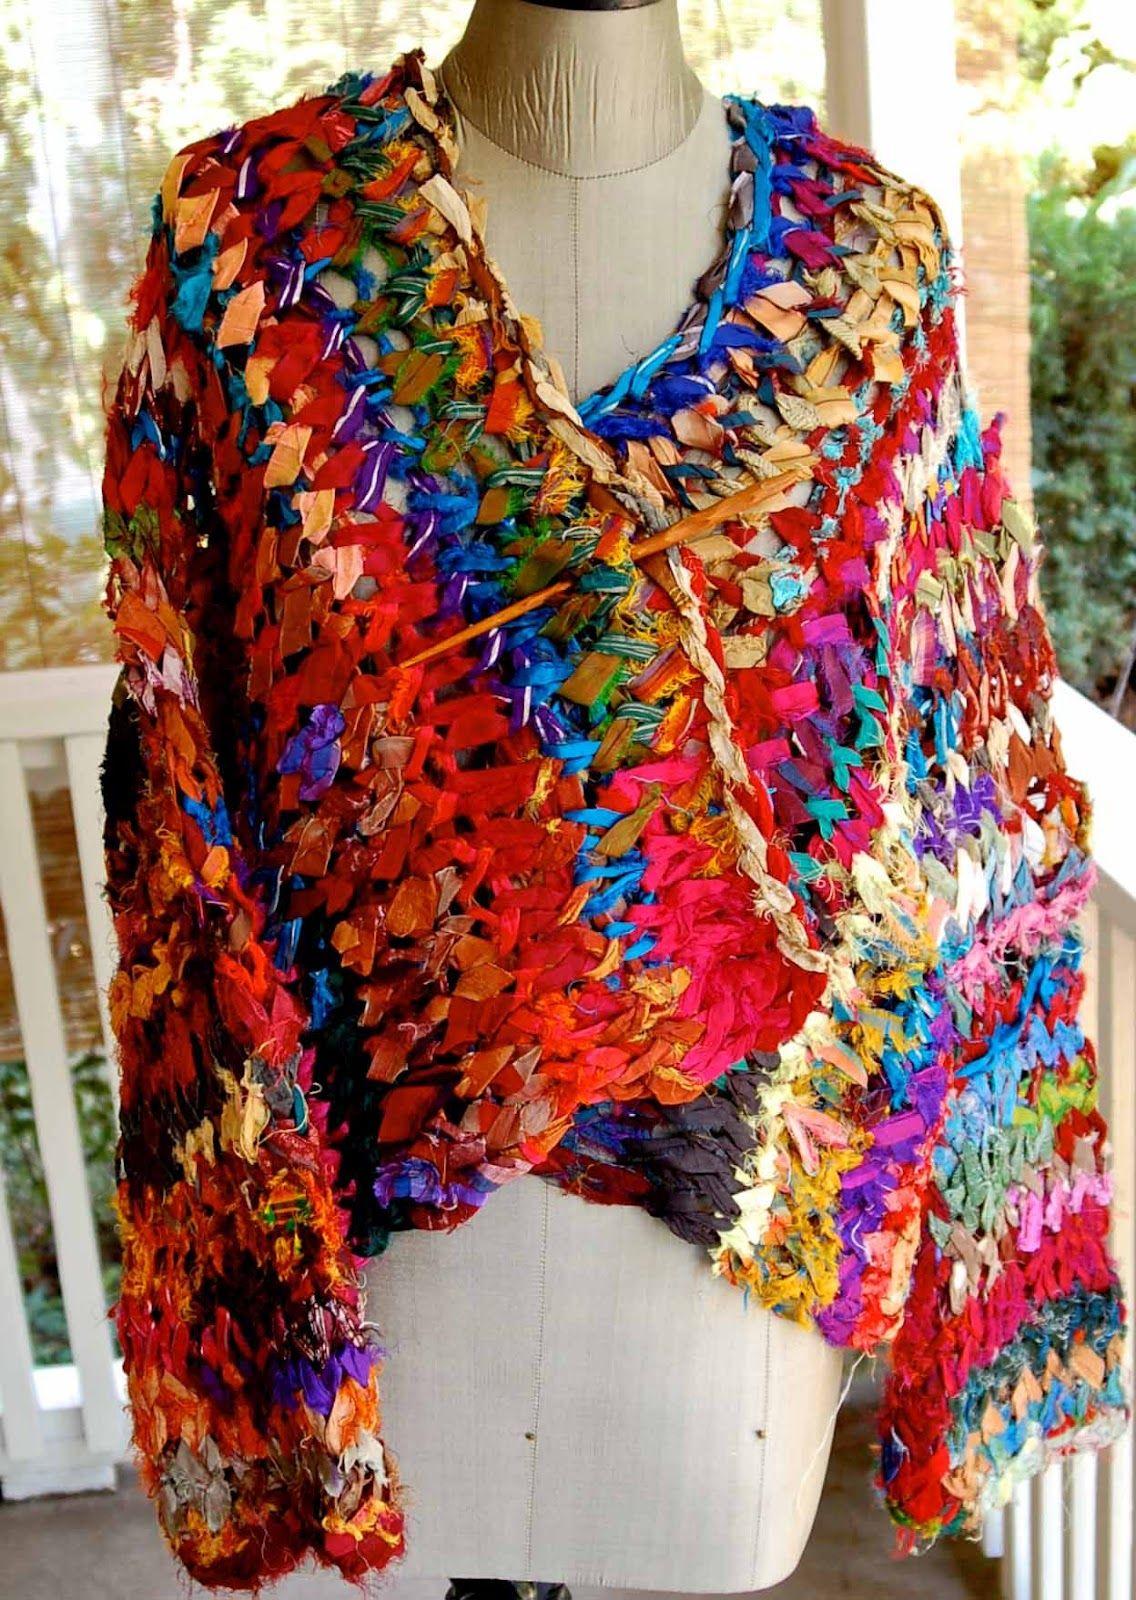 Knitting Patterns For Ribbon Yarn : Sari Silk Ribbon project K n i t Pinterest Silk, Fiber art and Sari silk